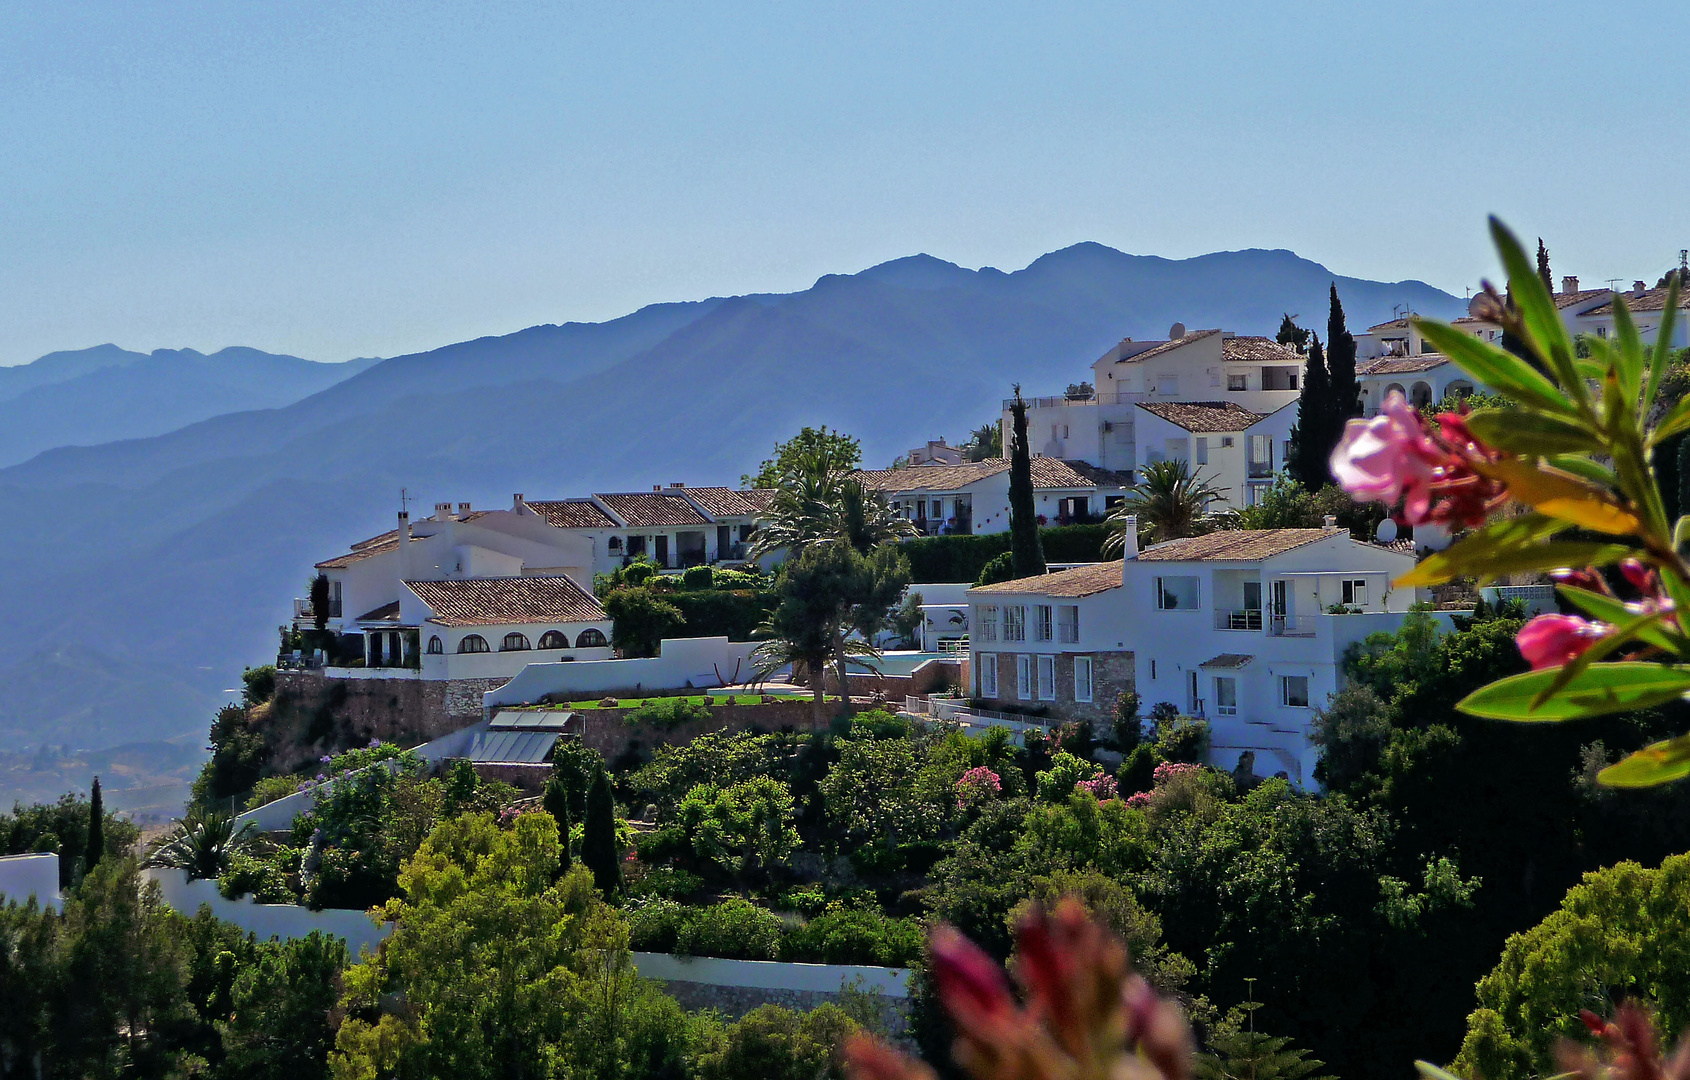 Am Fuß der Berge - Andalusien